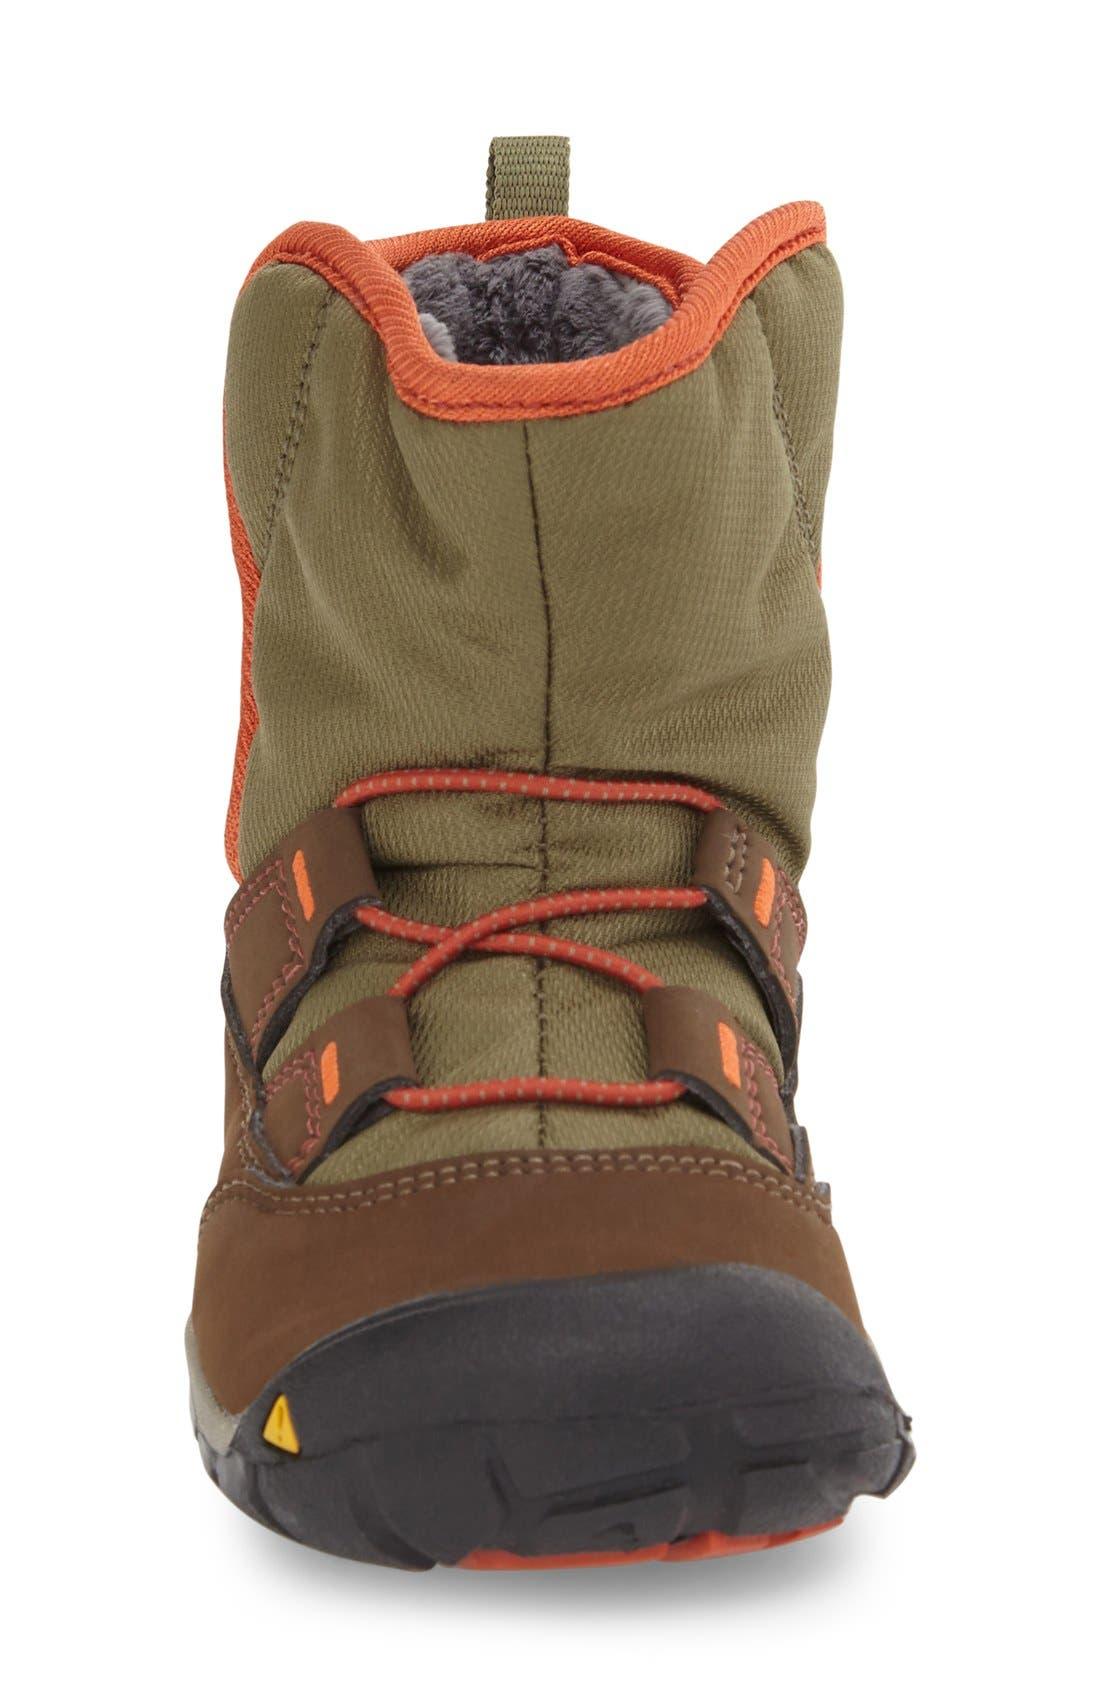 Peek-A-Boot Boot,                             Alternate thumbnail 3, color,                             201